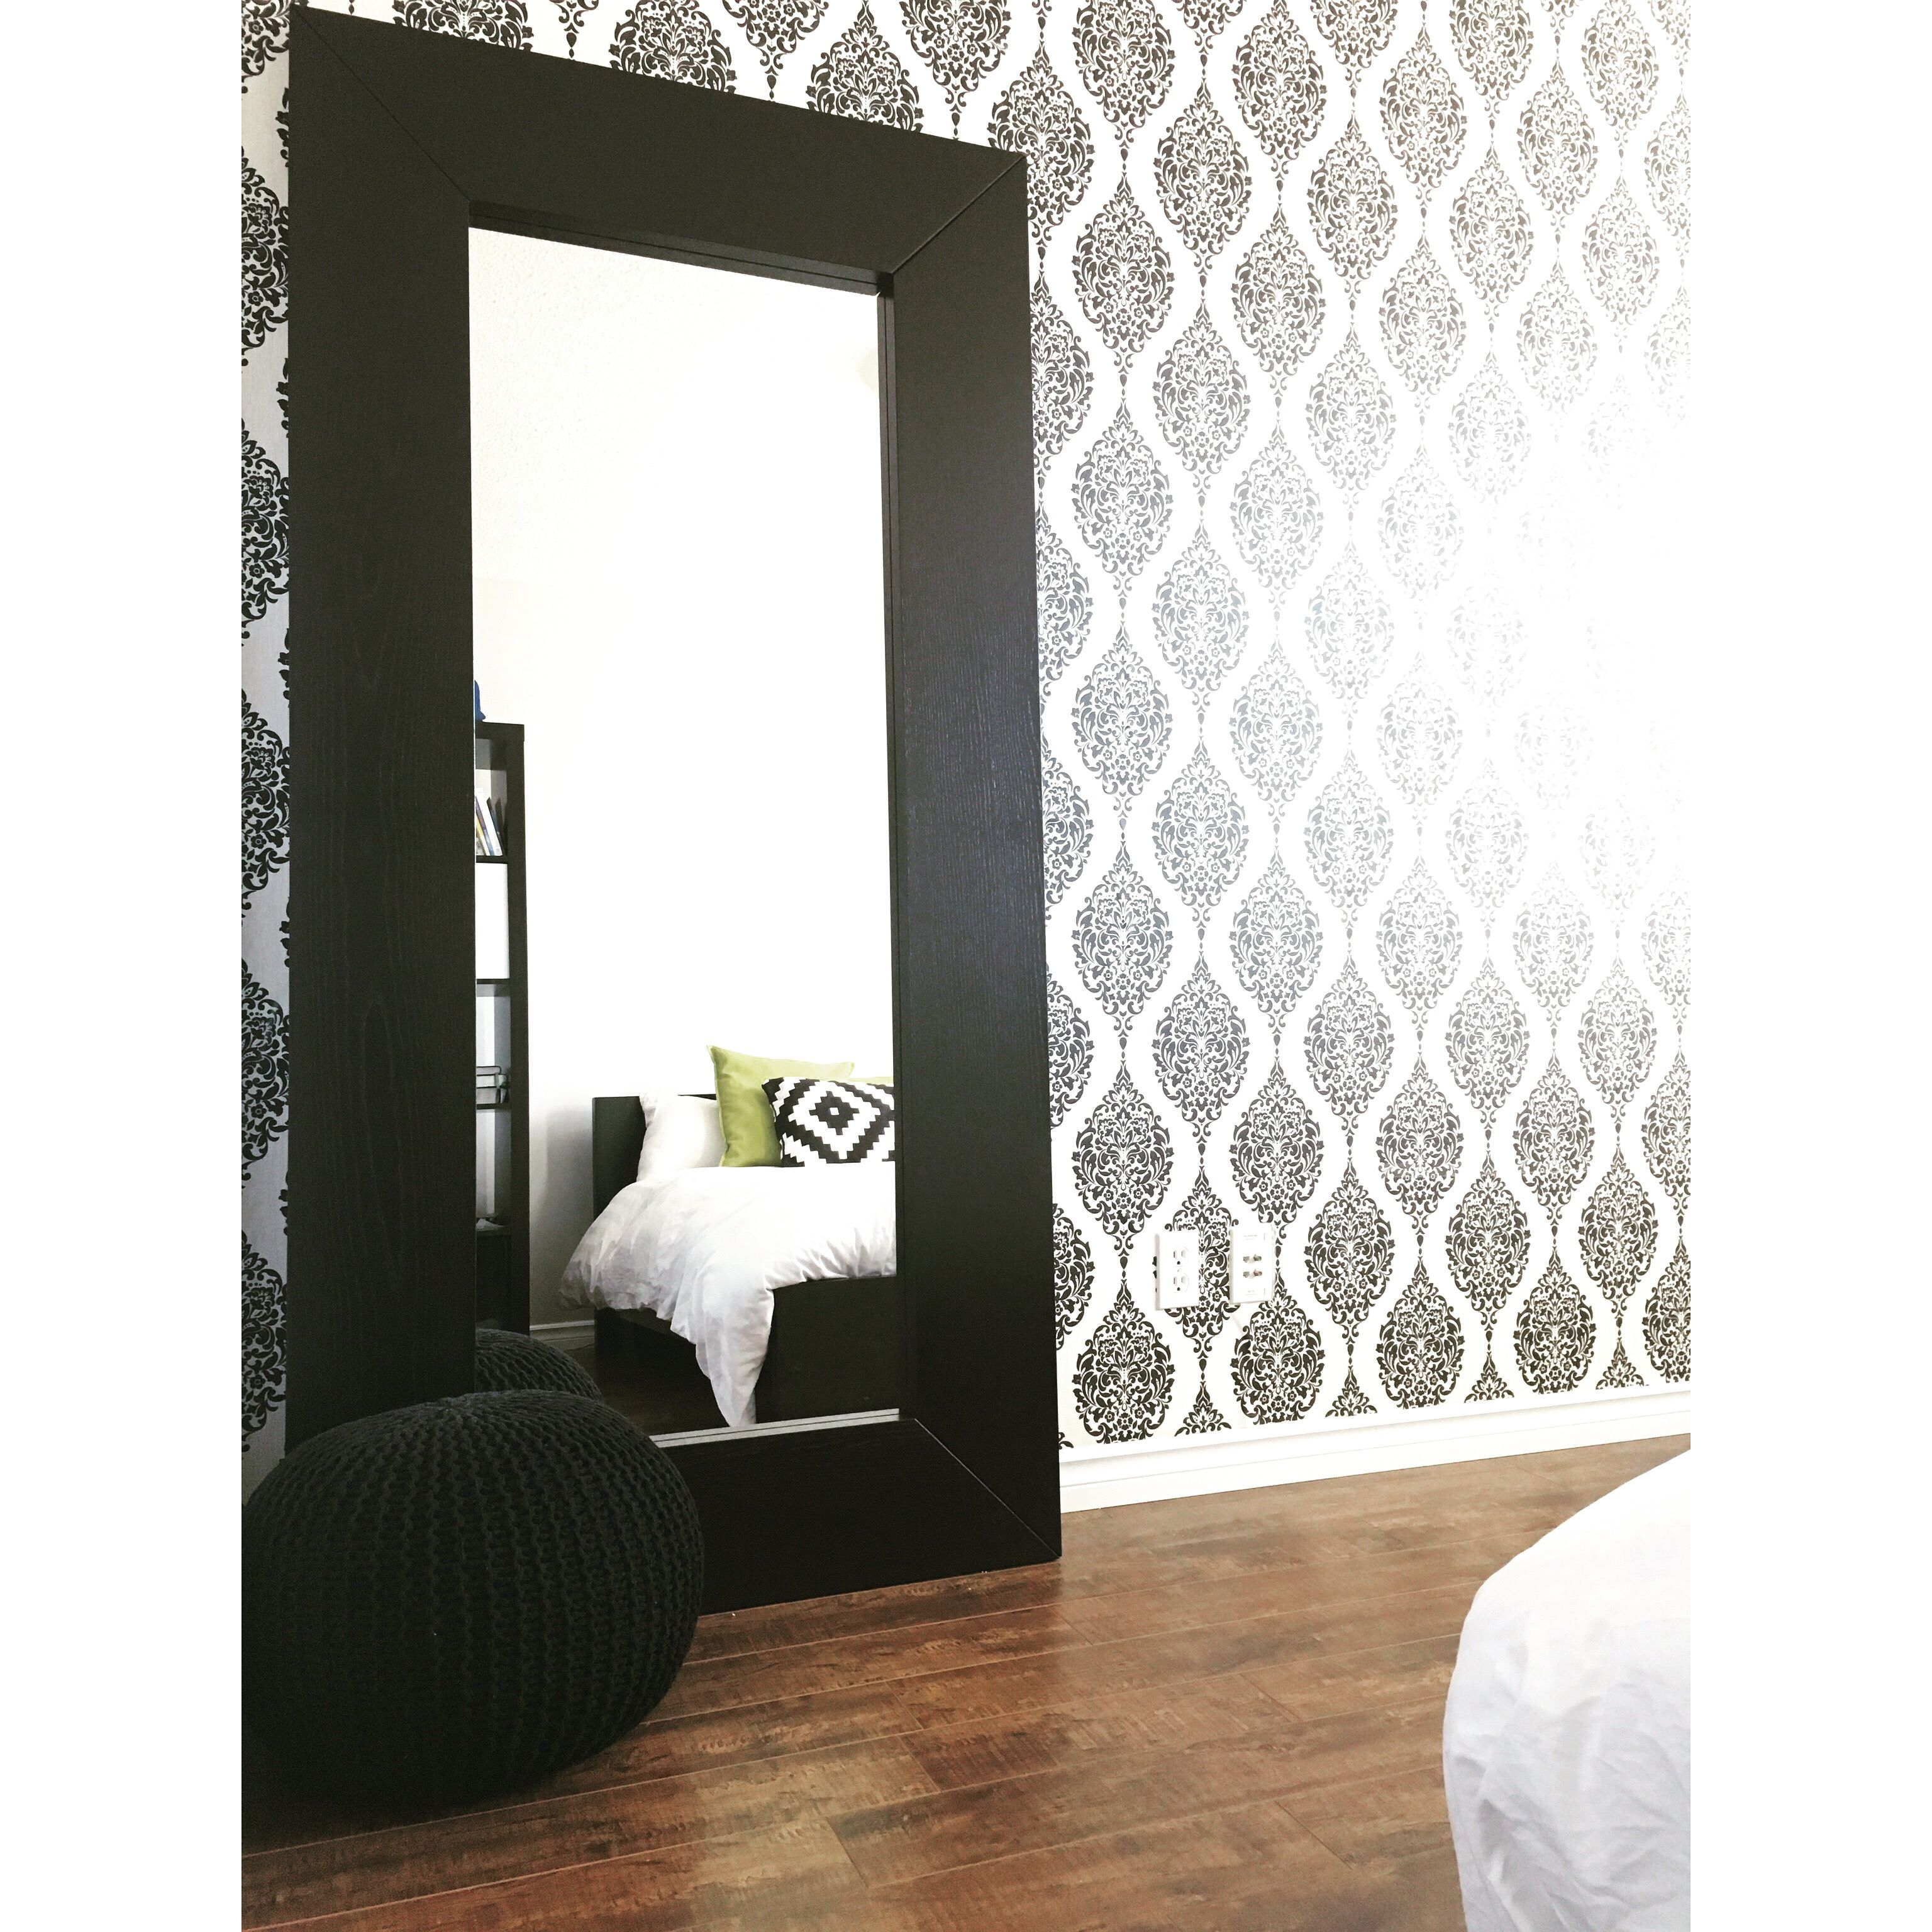 Bedroom decor #homedecor #pouff #mirror #wallpaper